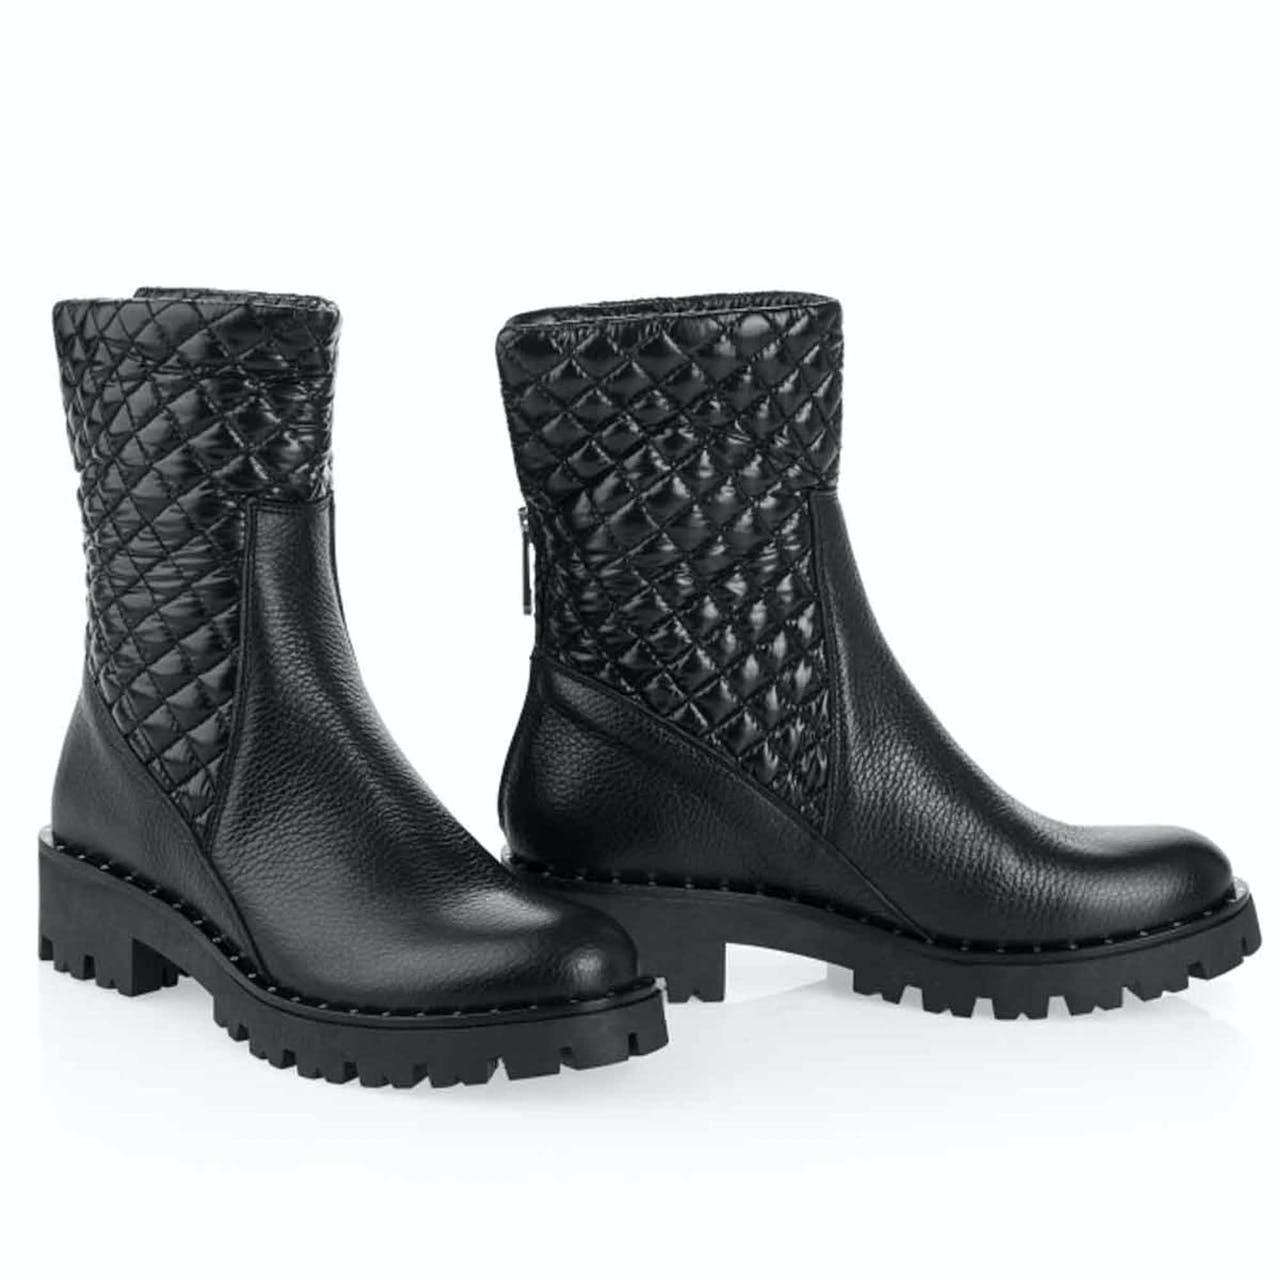 Boots - Leder-Mix